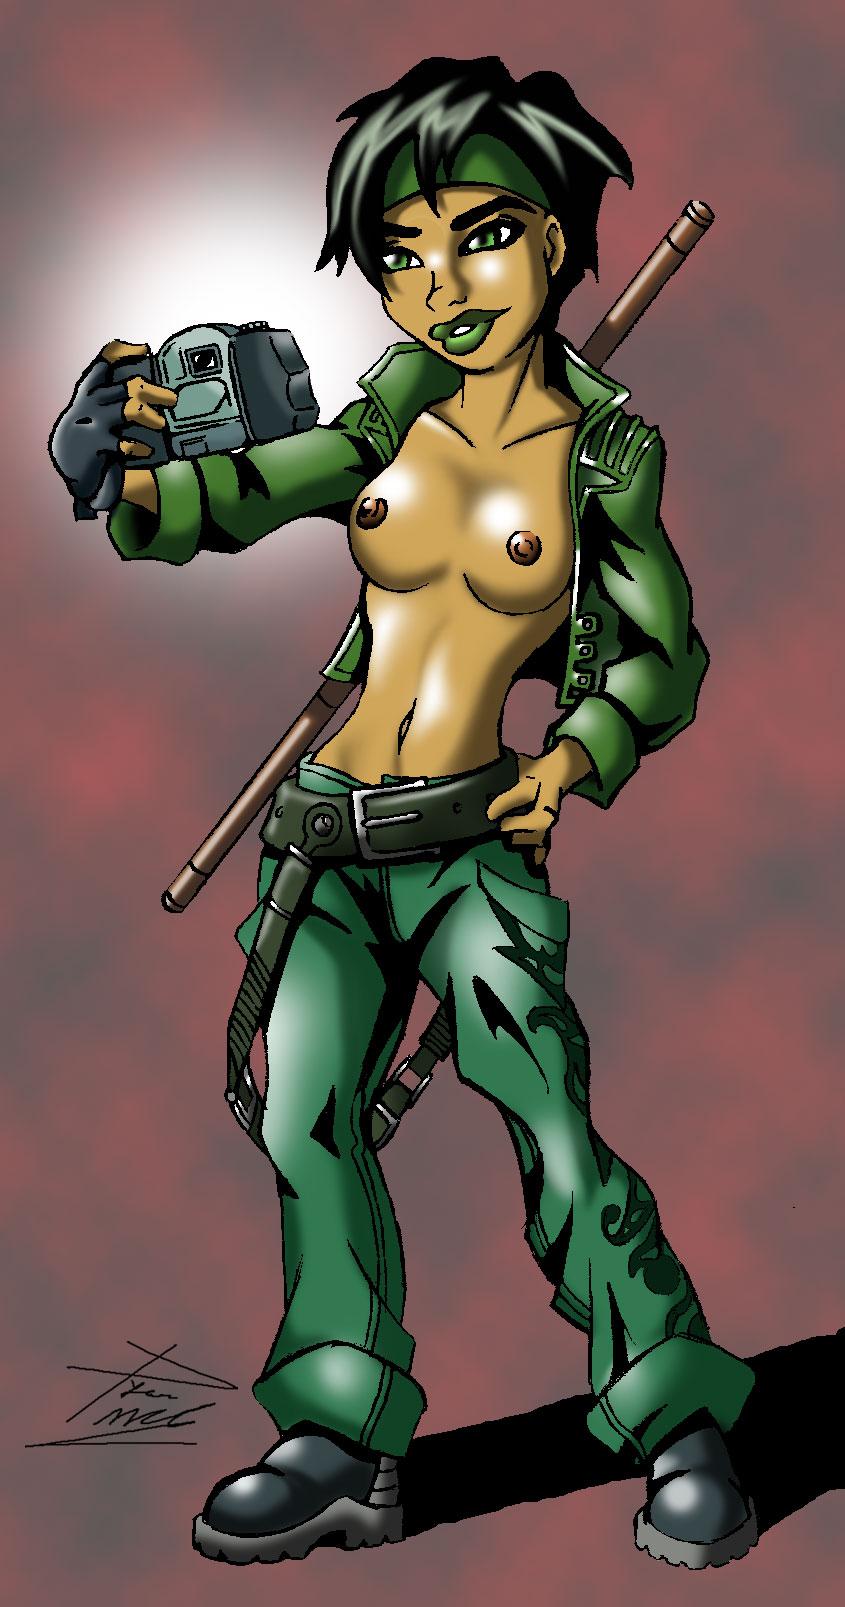 lord marksman vanadis and uncensored Boom-boom x-men